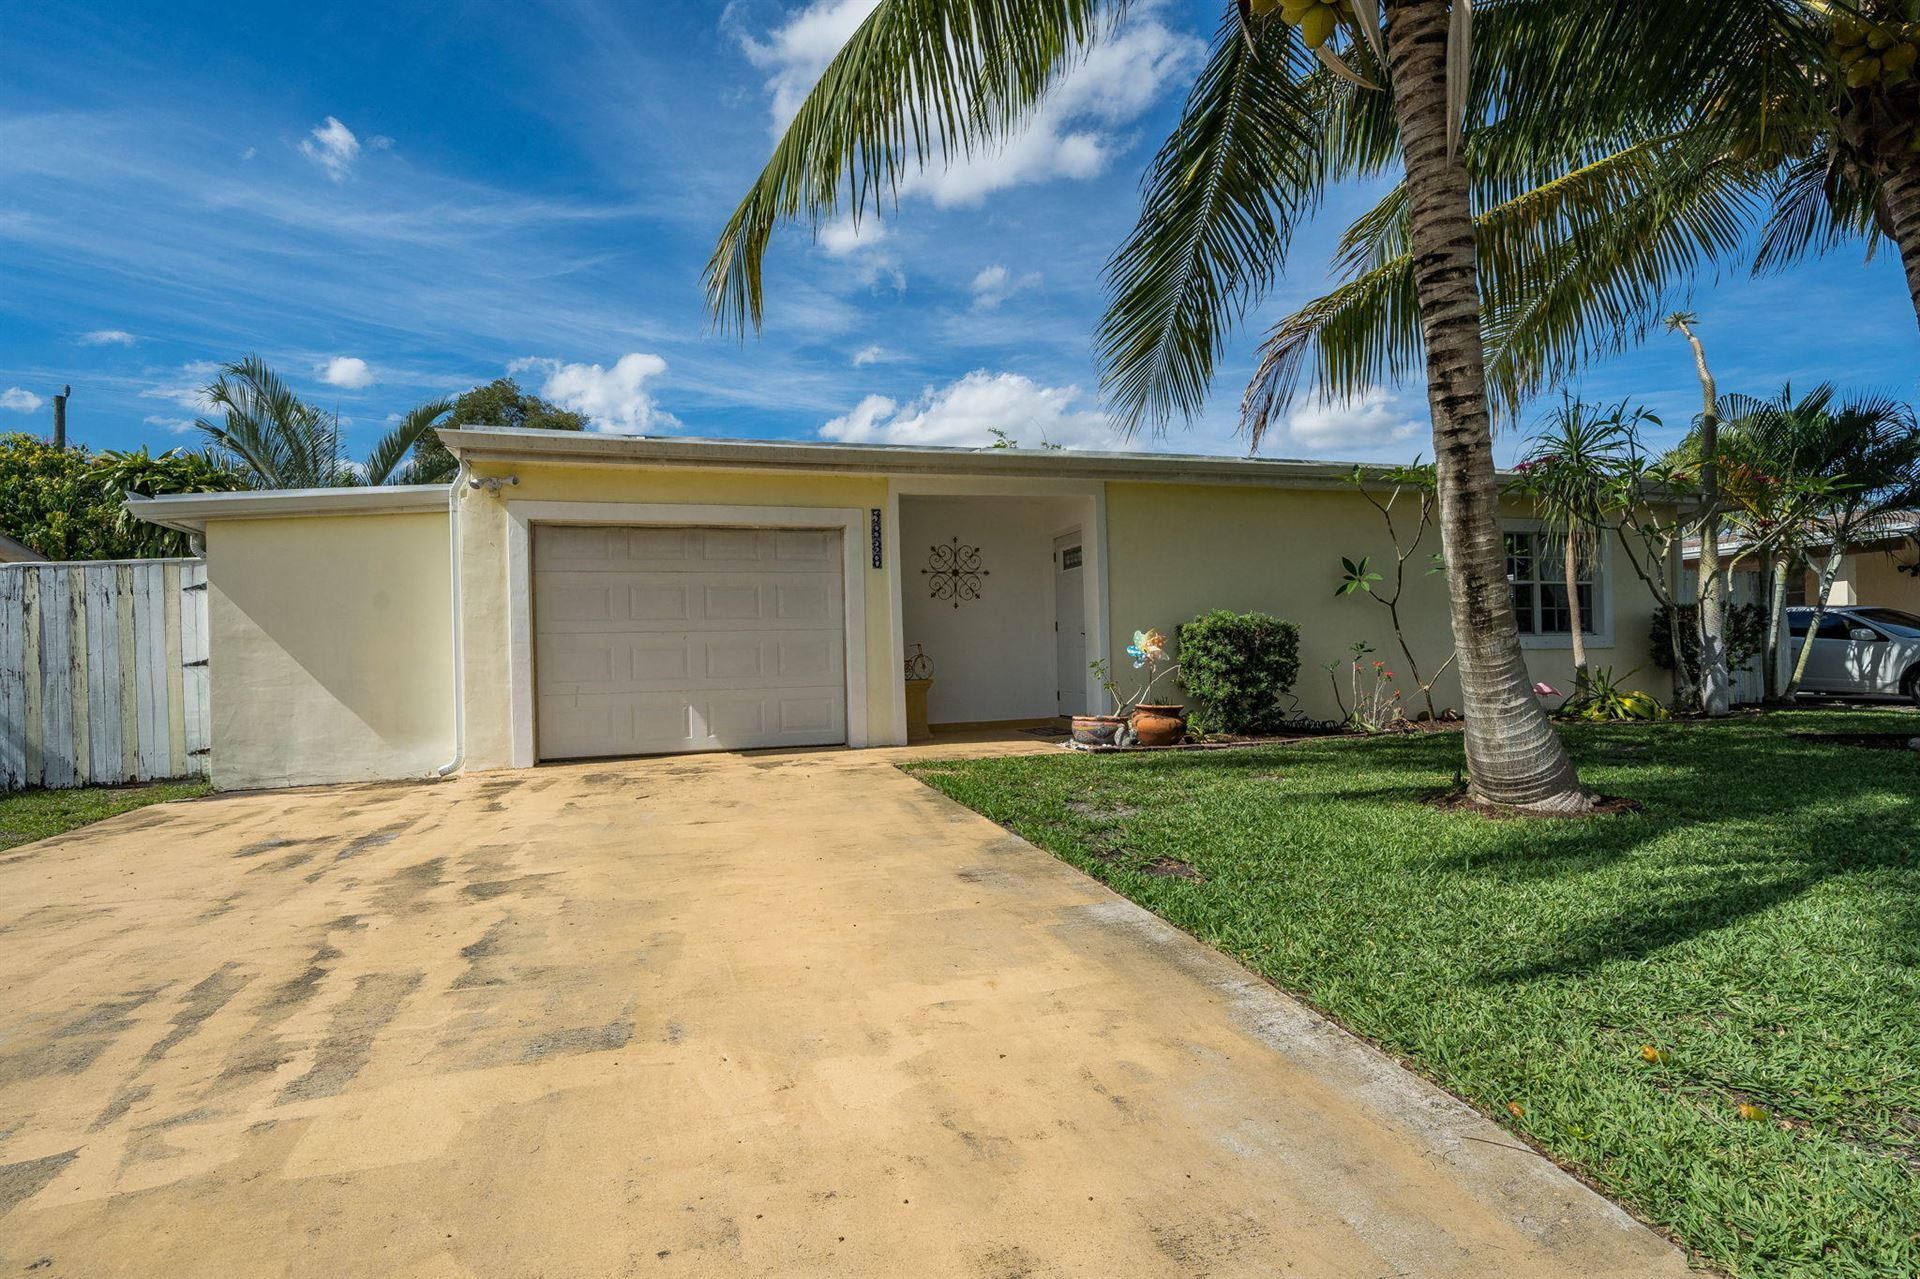 5839 Daphne Drive, West Palm Beach, FL 33415 - #: RX-10724120